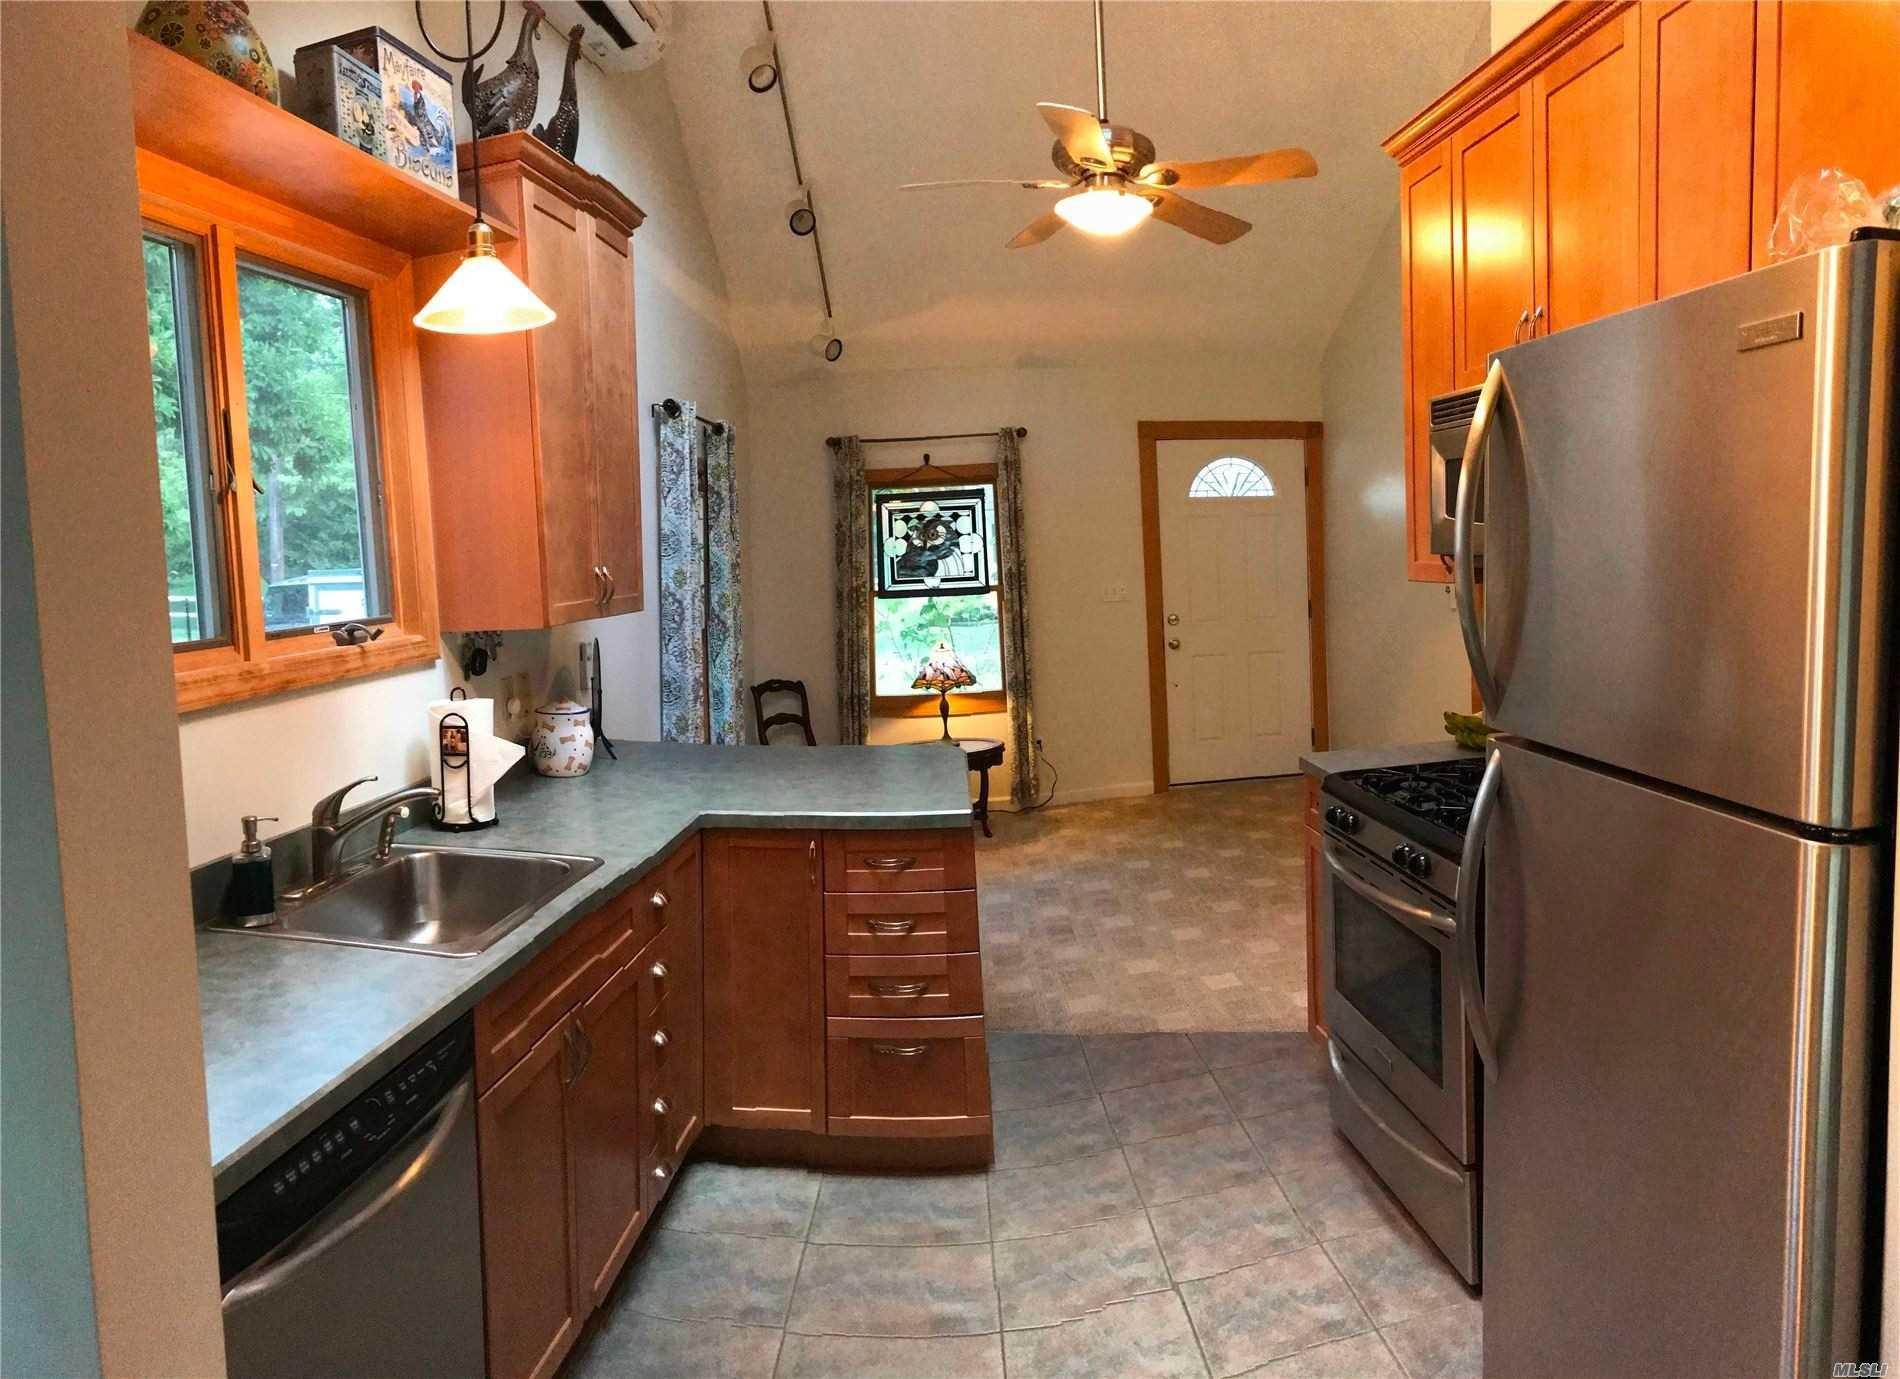 26 Breezy Point Road, Wading River, NY 11792 - MLS#: 3238339